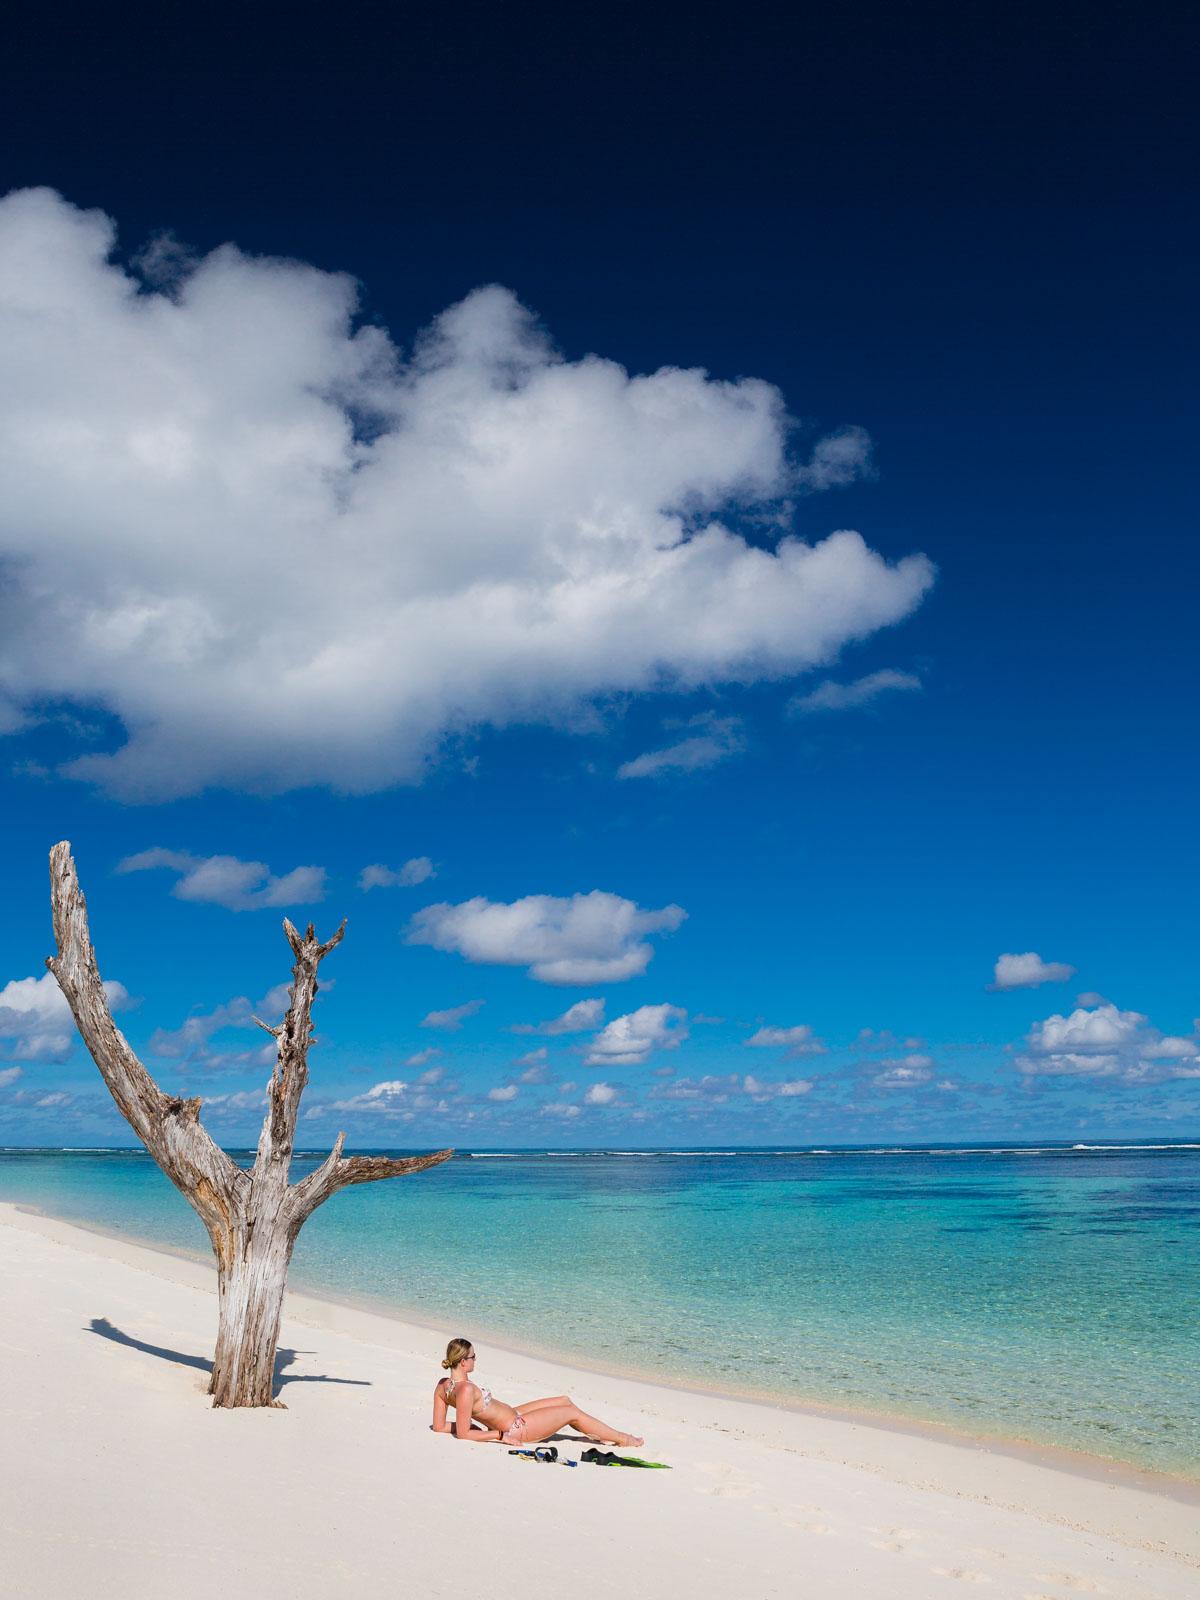 beach-girl-bikini-bird-island-seychelles-wanderlust-destination-photograper